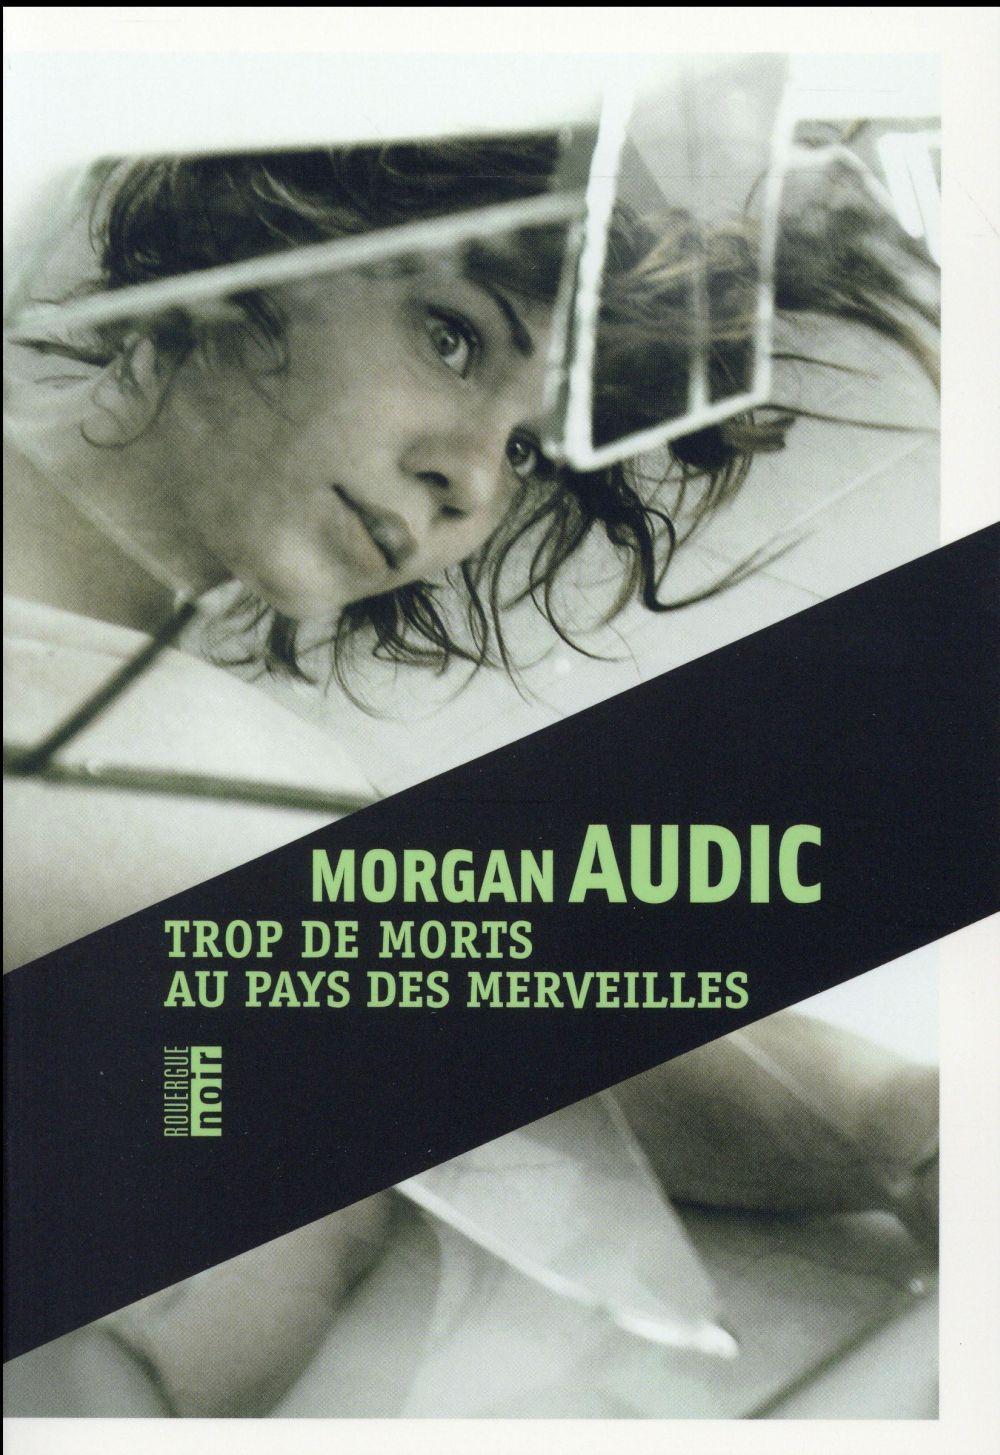 Audic Morgan - TROP DE MORTS AU PAYS DES MERVEILLES